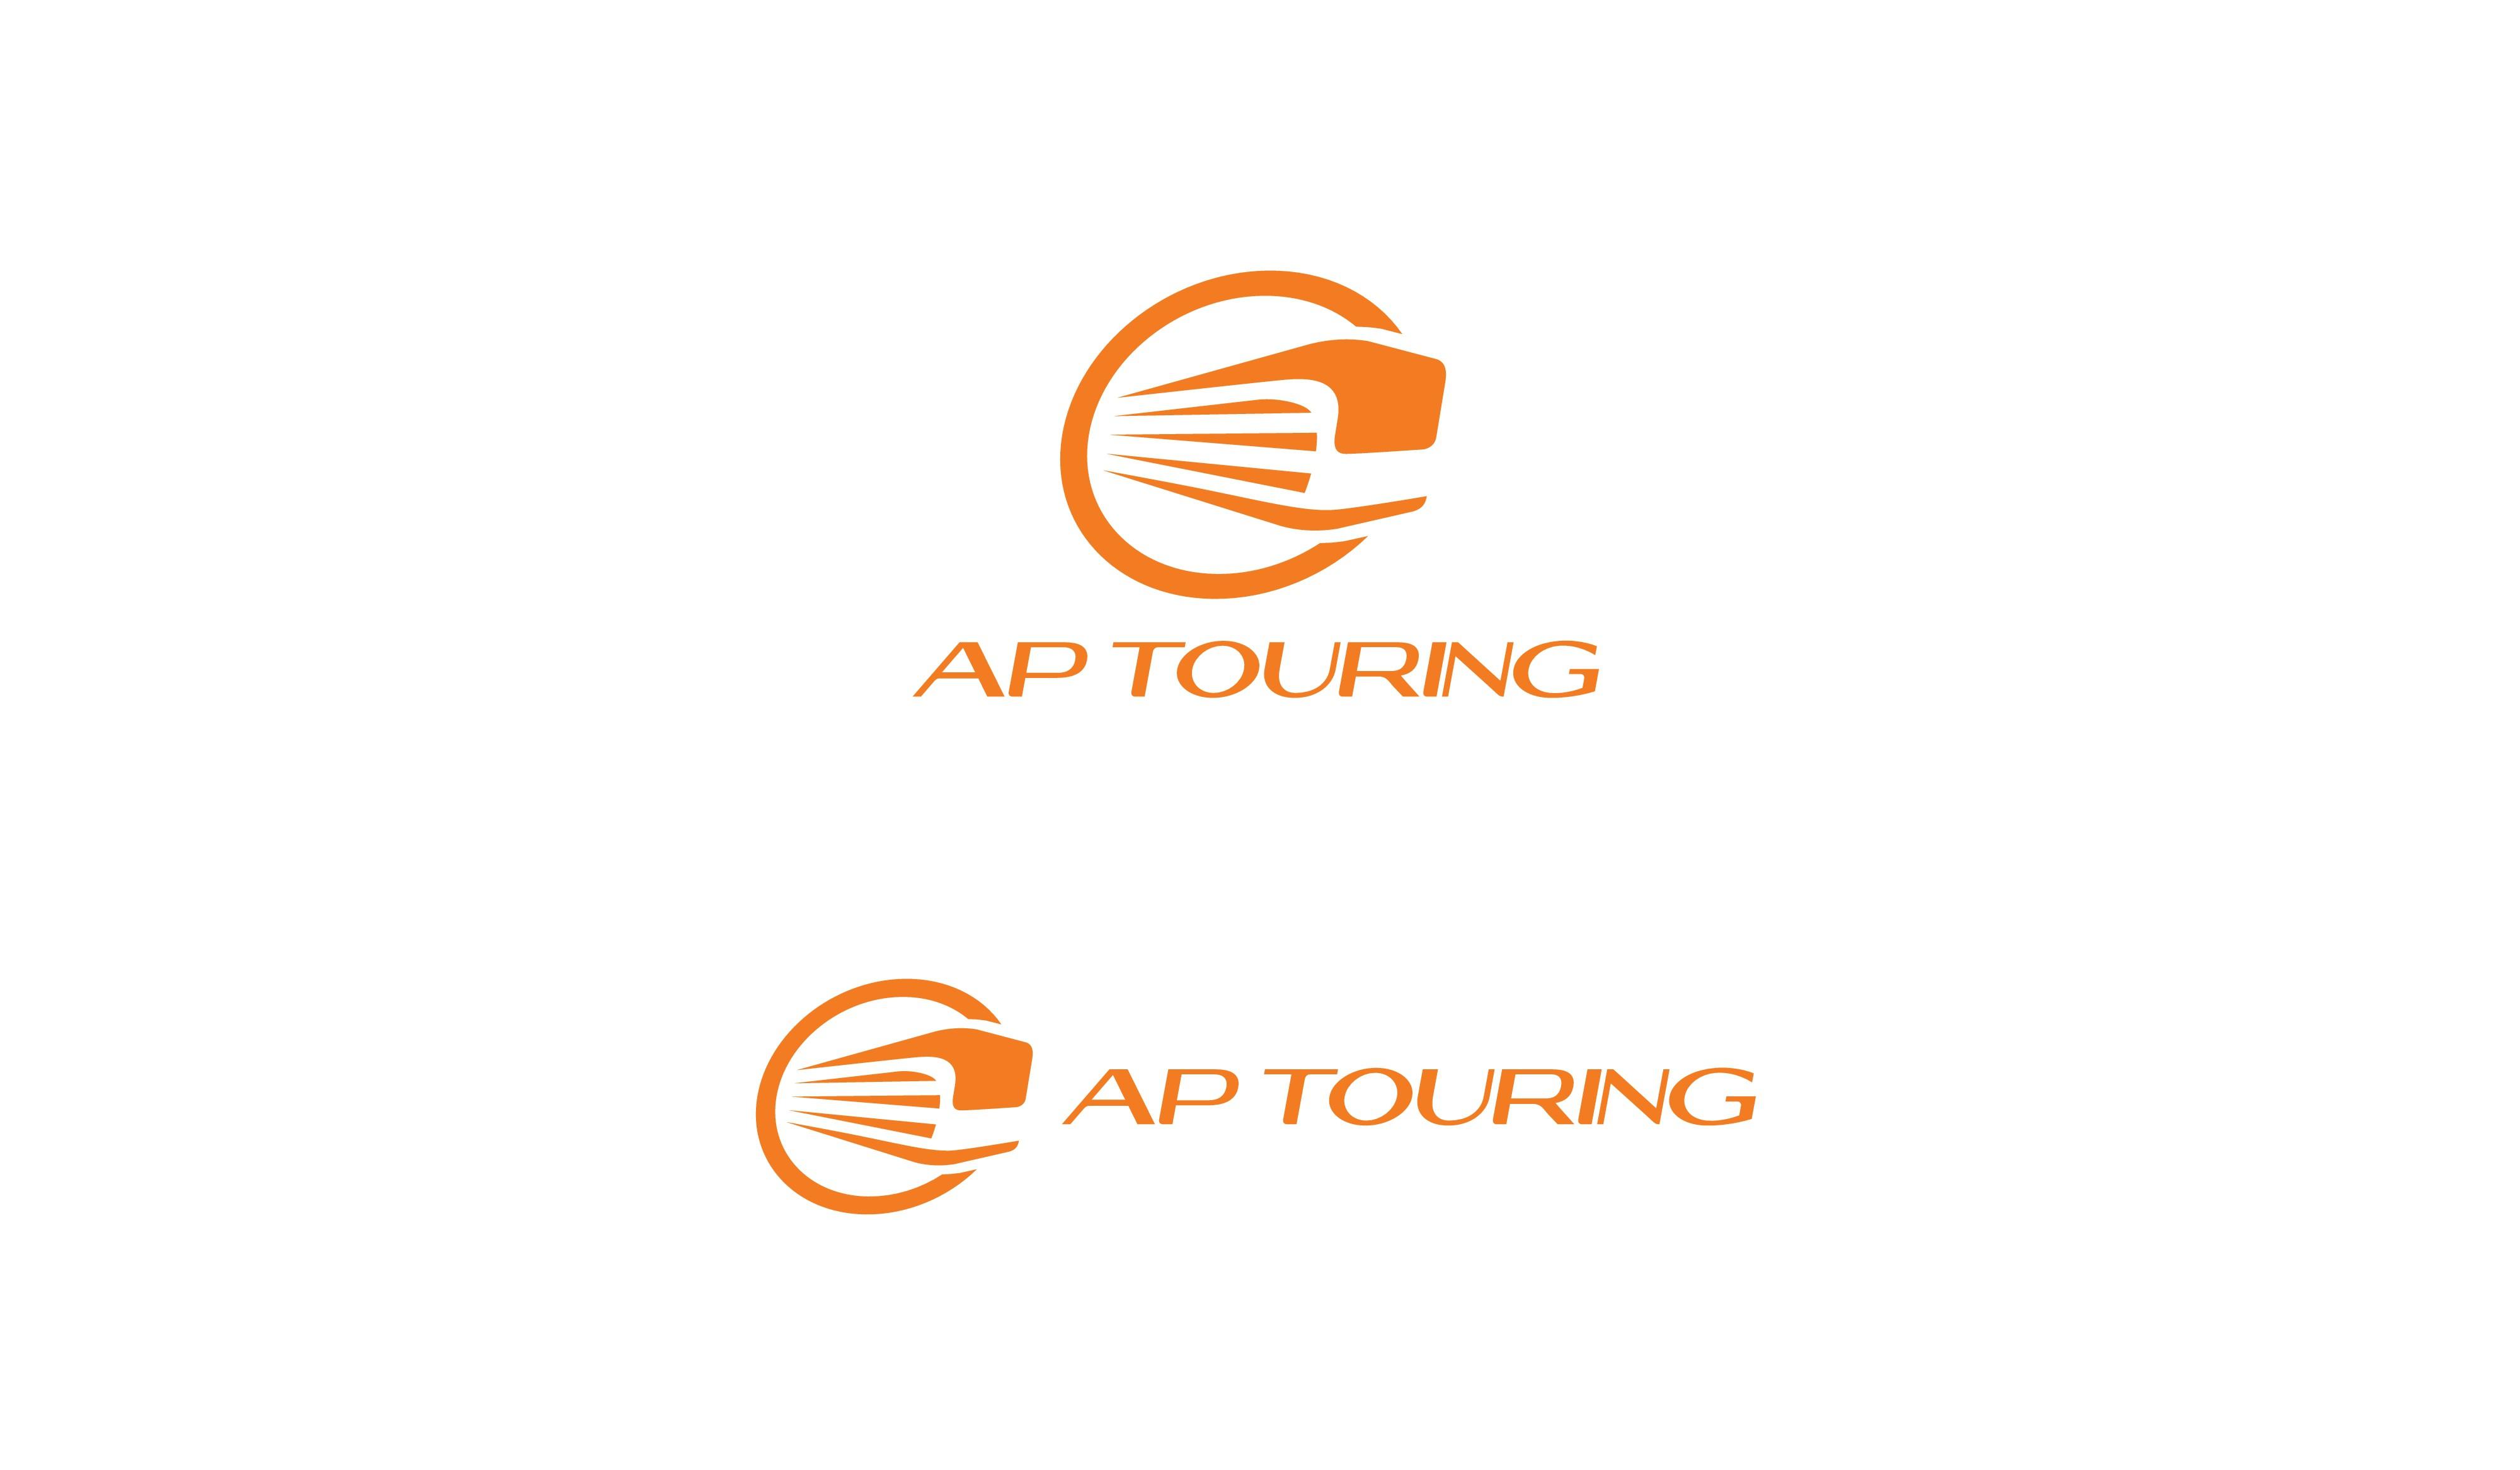 Touring bands deserve a fab tourbus with a fresh logo.